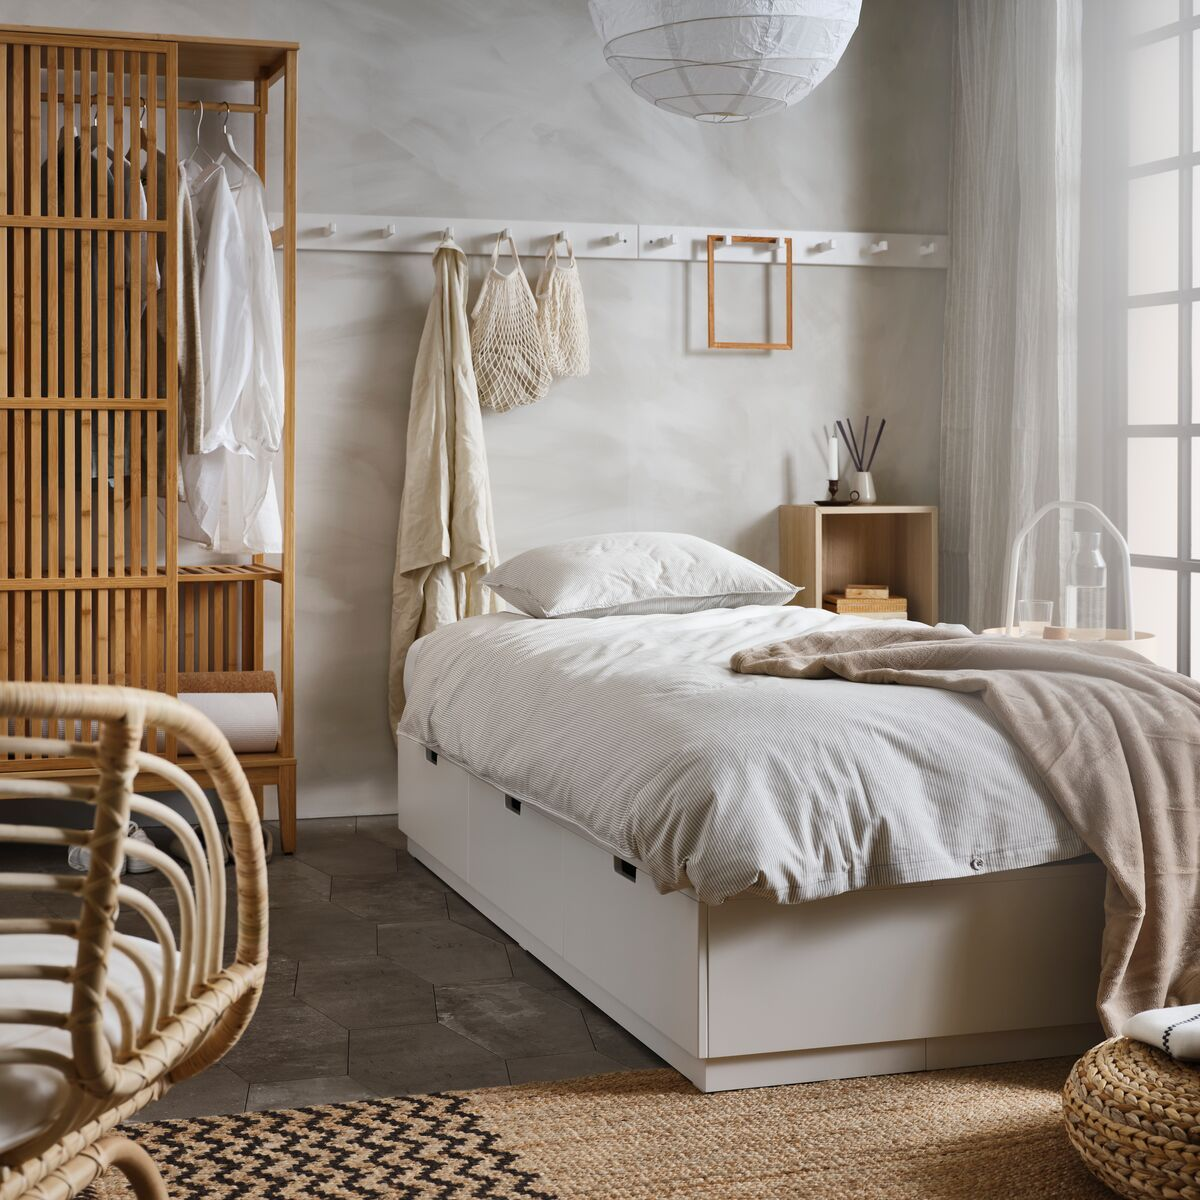 Nordli Bed Frame With Storage White Ikea Switzerland In 2020 Bed Frame With Storage Bed Frame Bed Decor